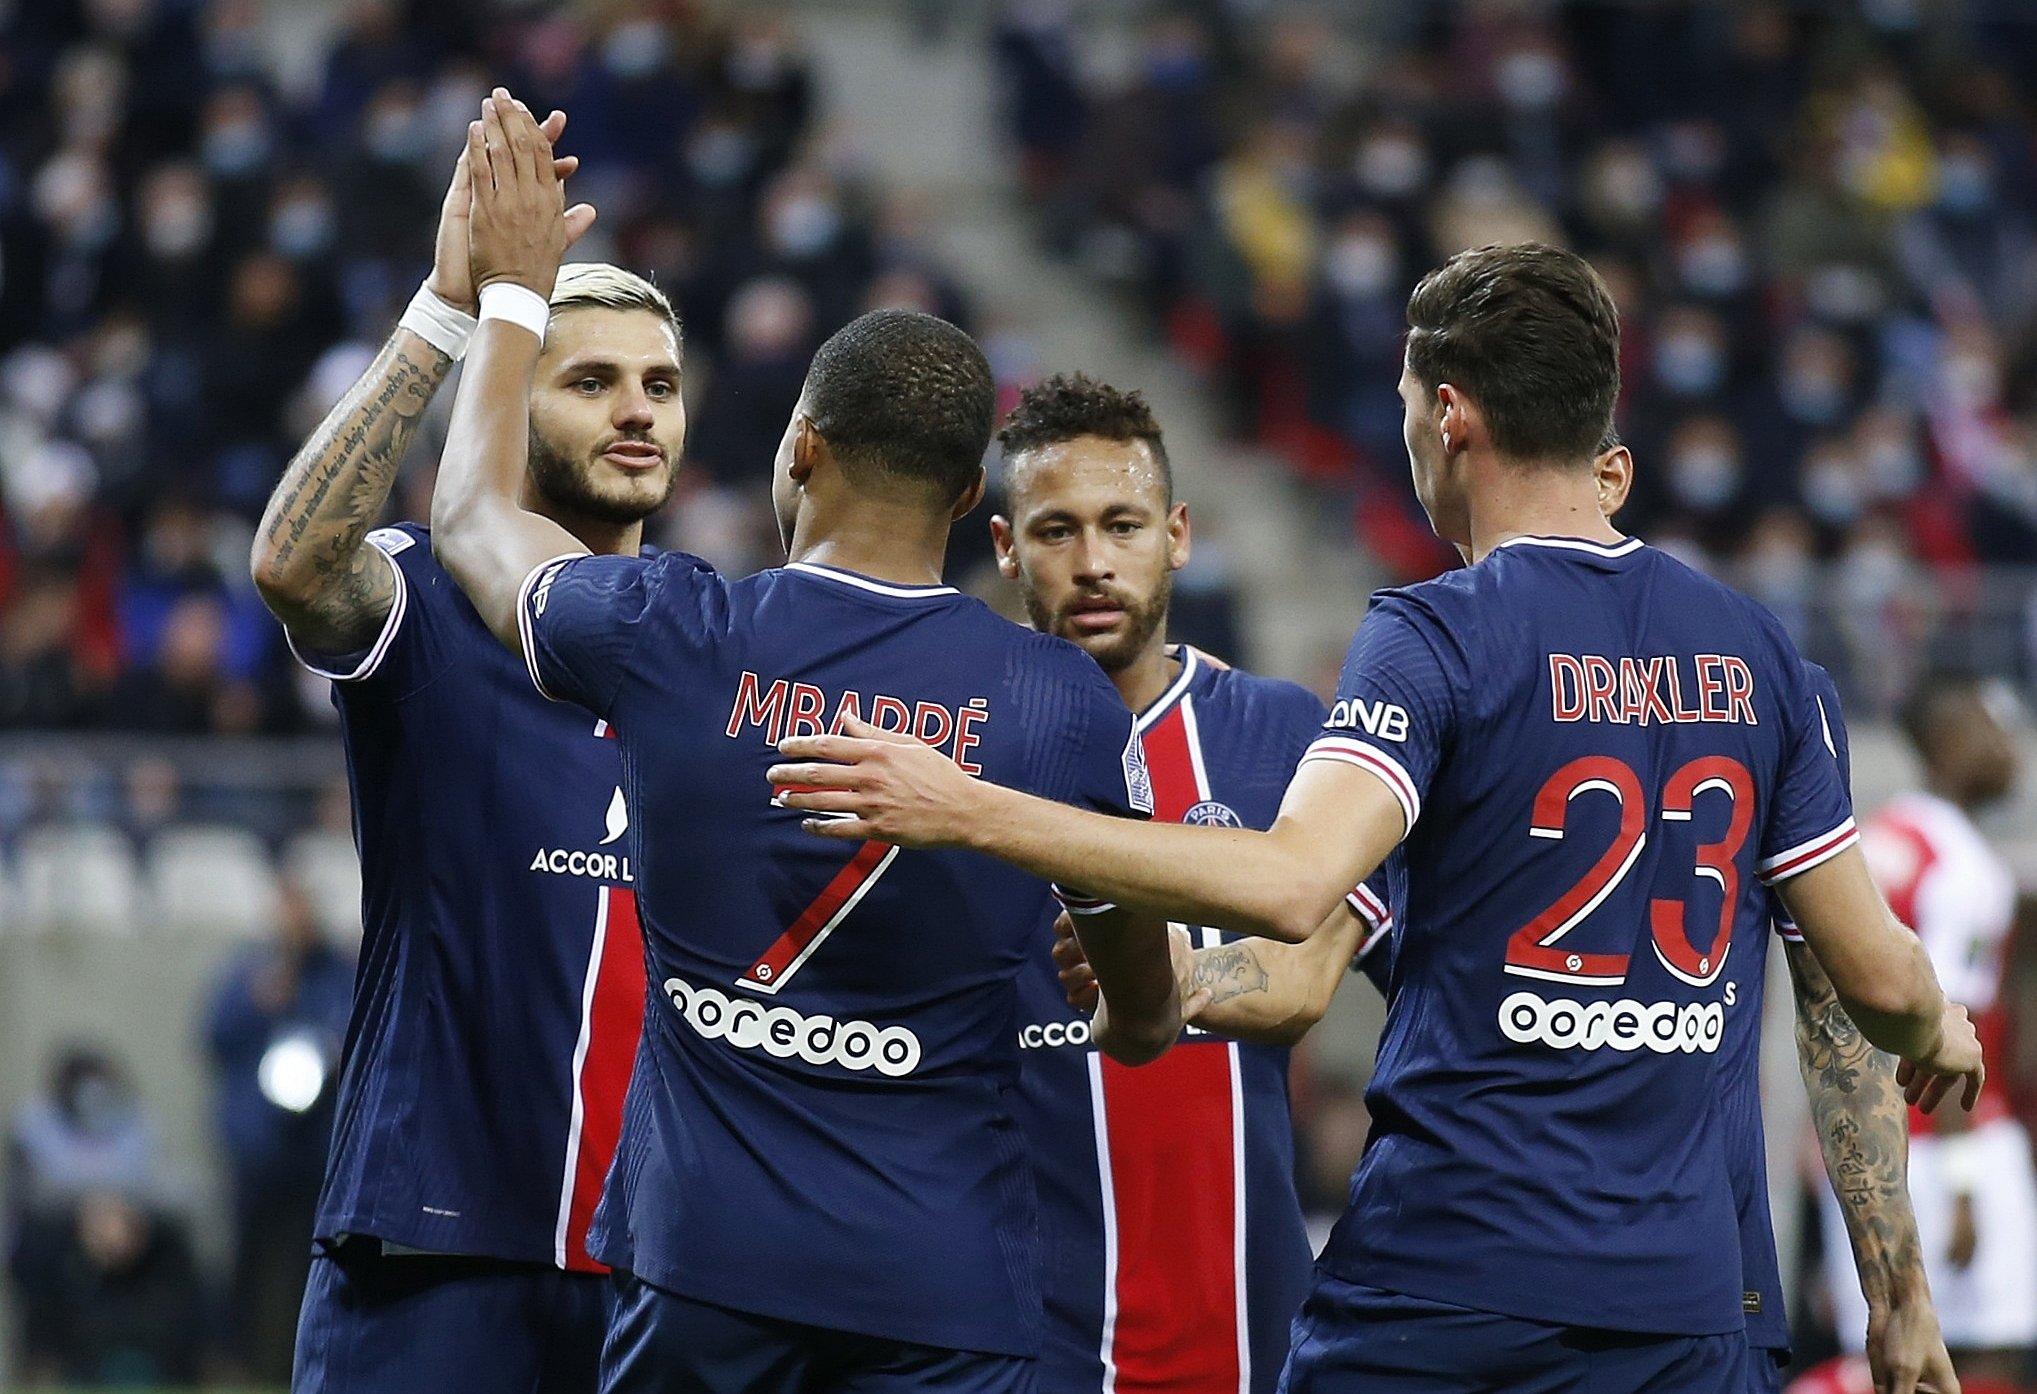 Ligue 1: Reims 0-2 Paris Saint-Germain PSG | MAÇ SONUCU - Aspor